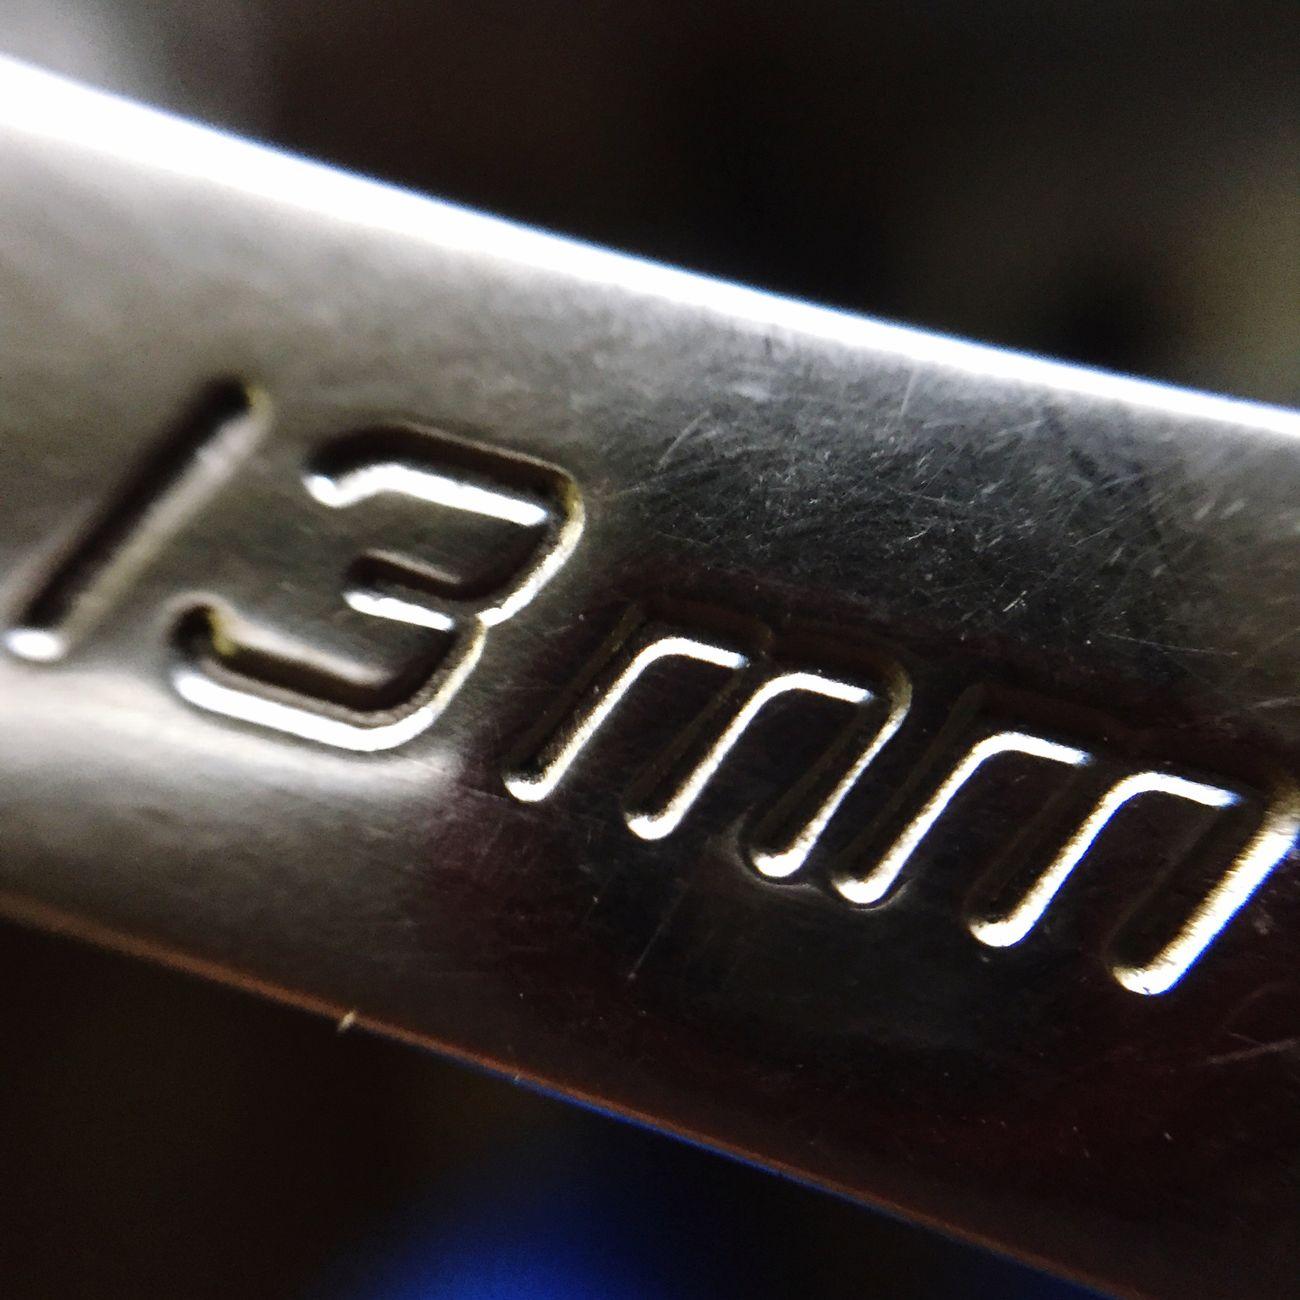 13mm Snapon Macro マクロ